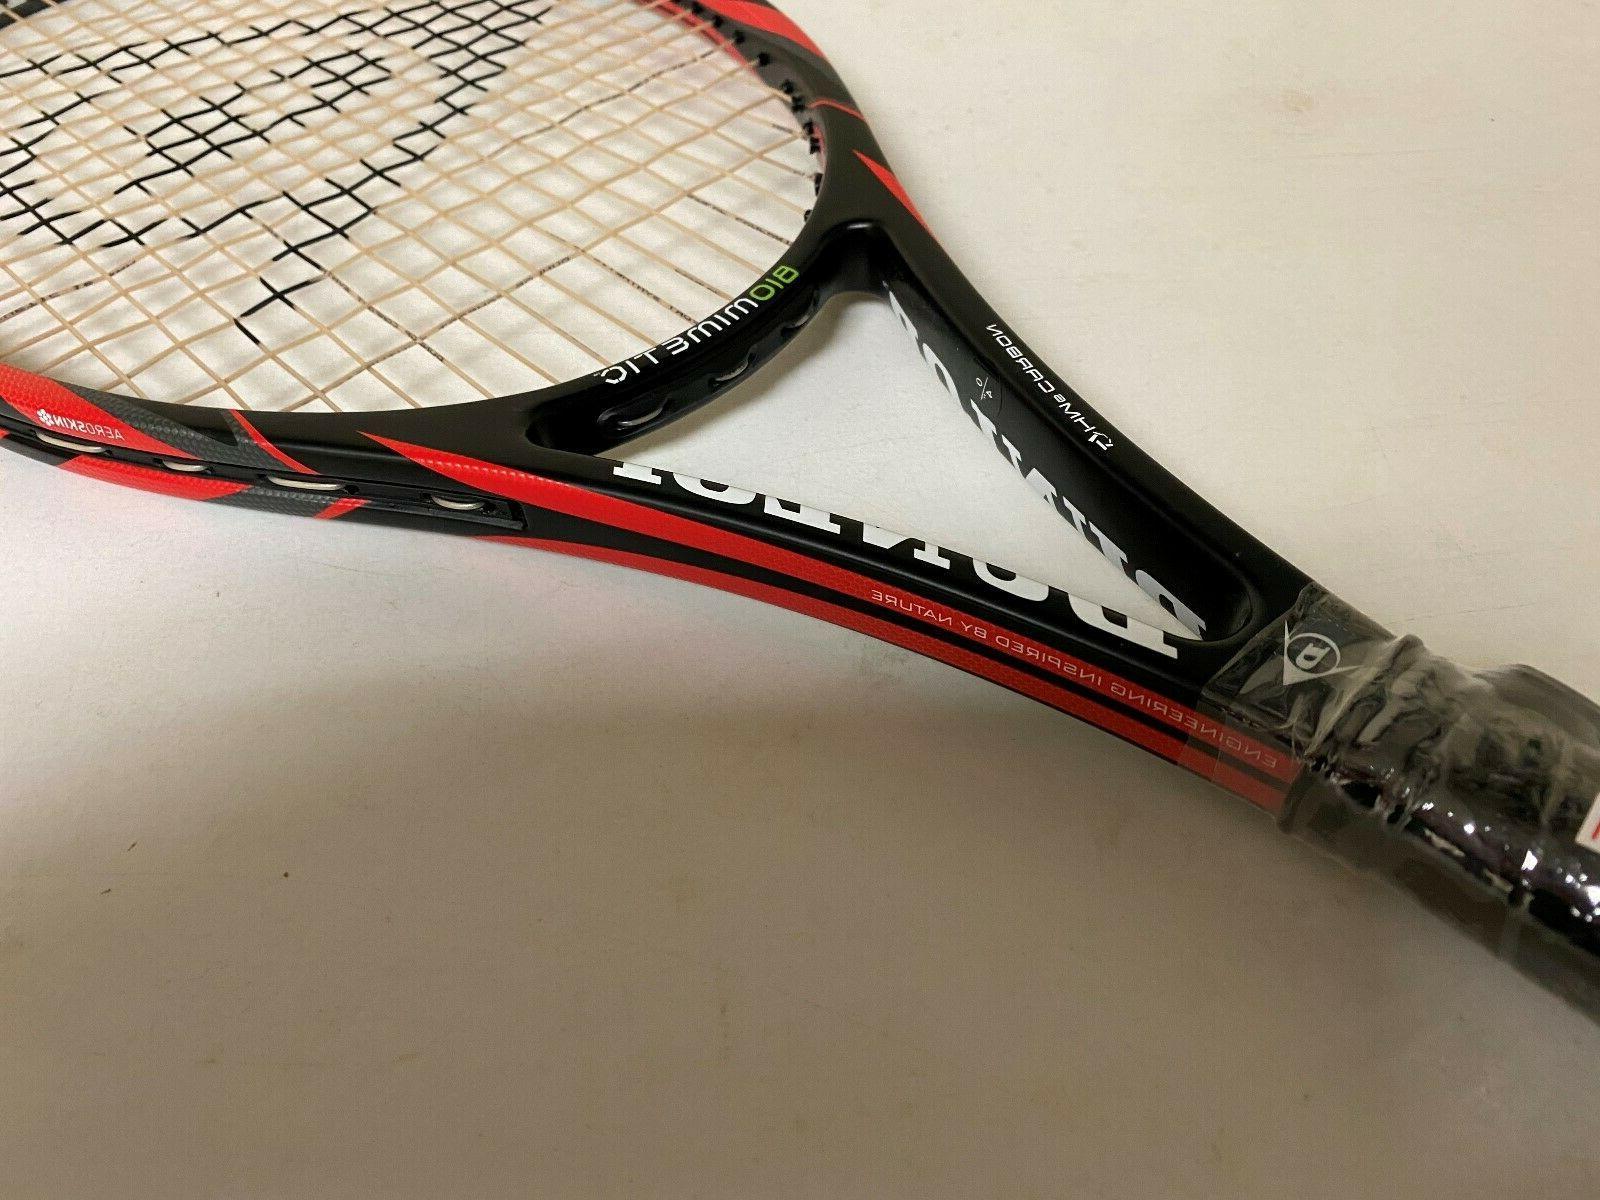 "Dunlop Biomimetic Junior 26"" Tennis Racquet"